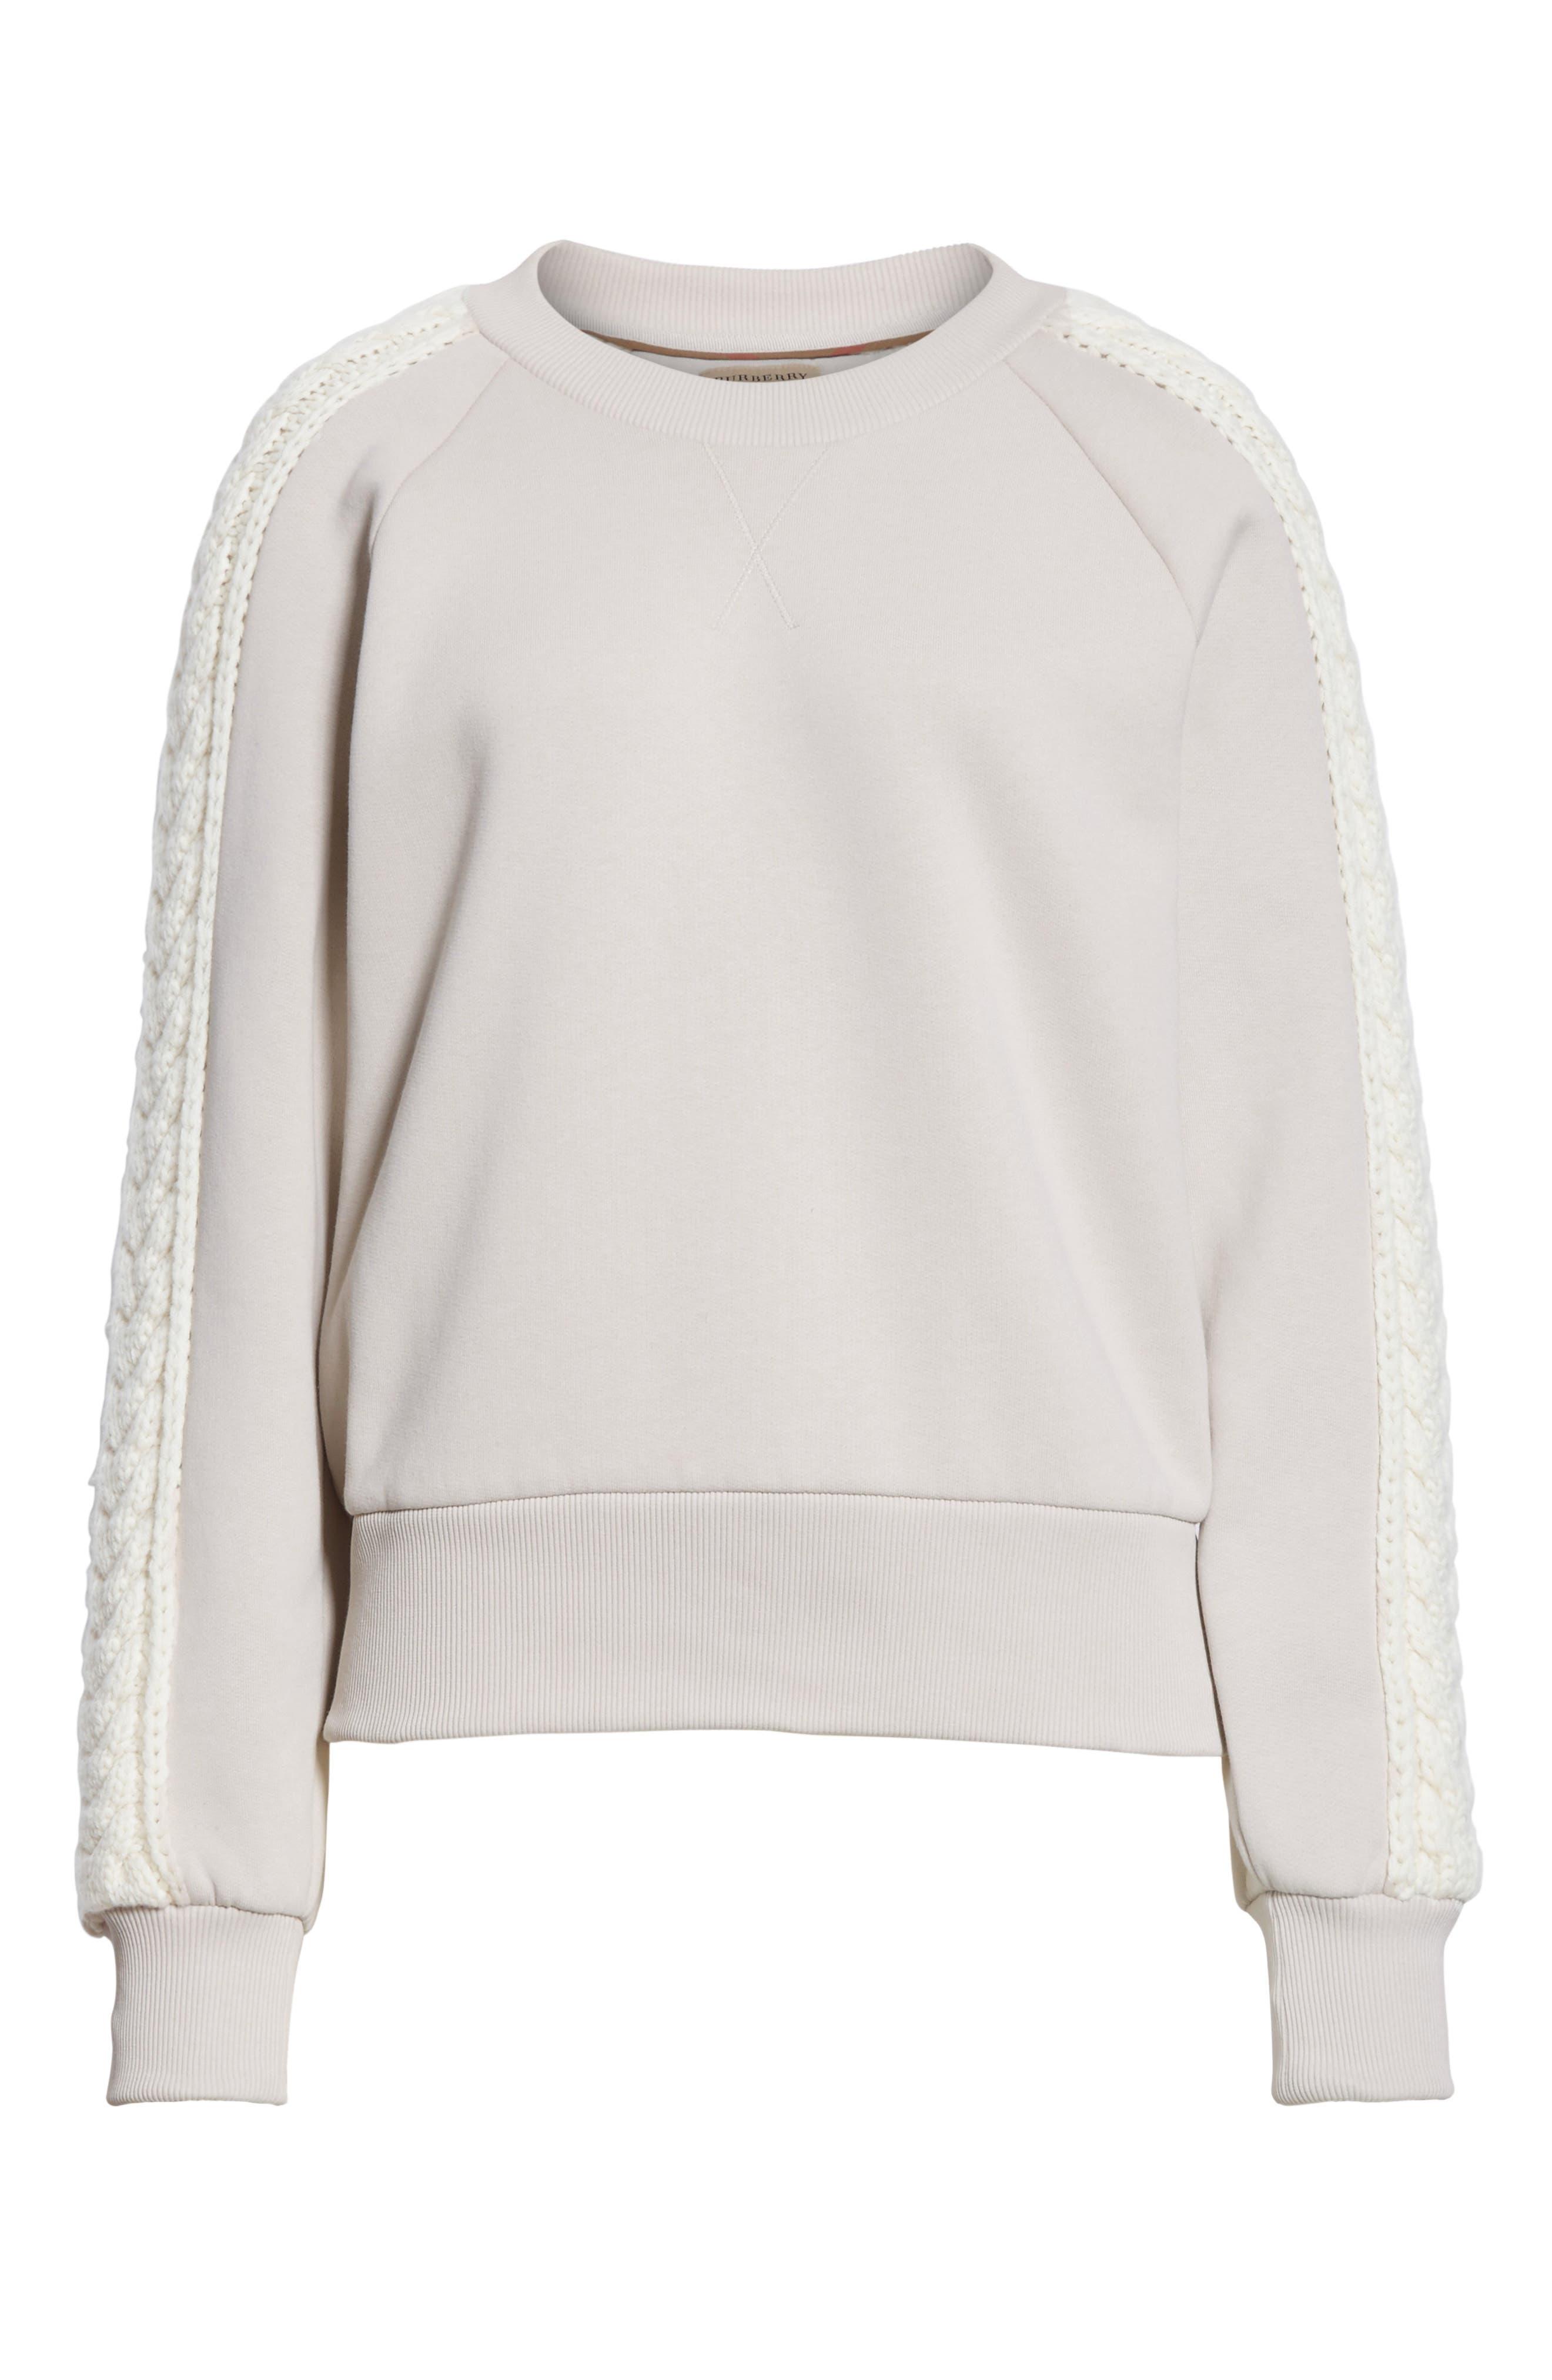 Selho Sweatshirt,                             Alternate thumbnail 6, color,                             106